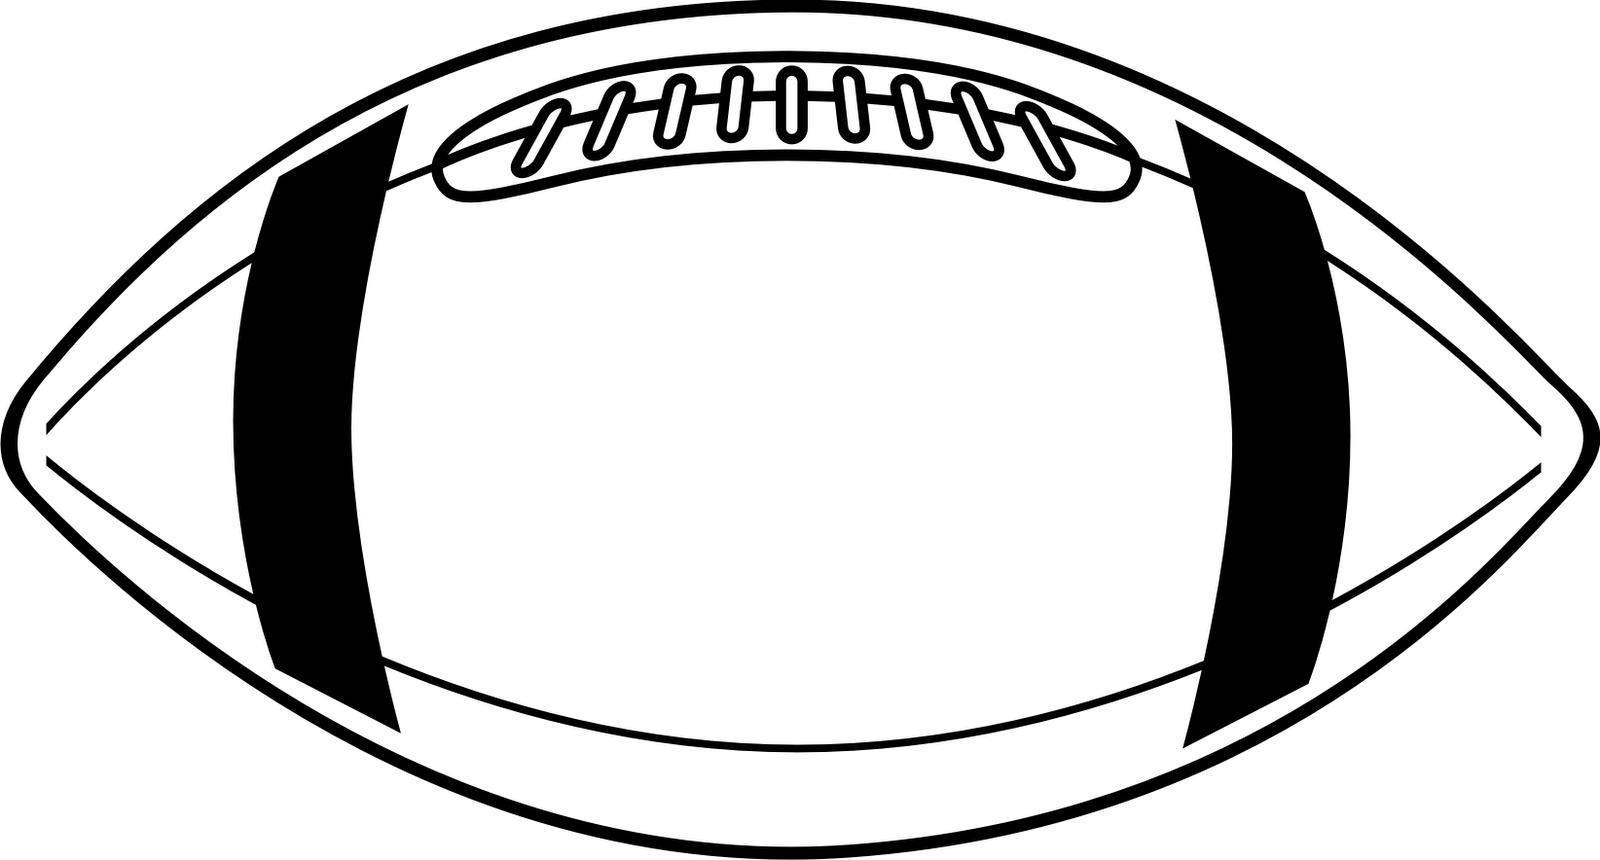 Football Image Clipart - Clipart library. Sports   Hobby Box